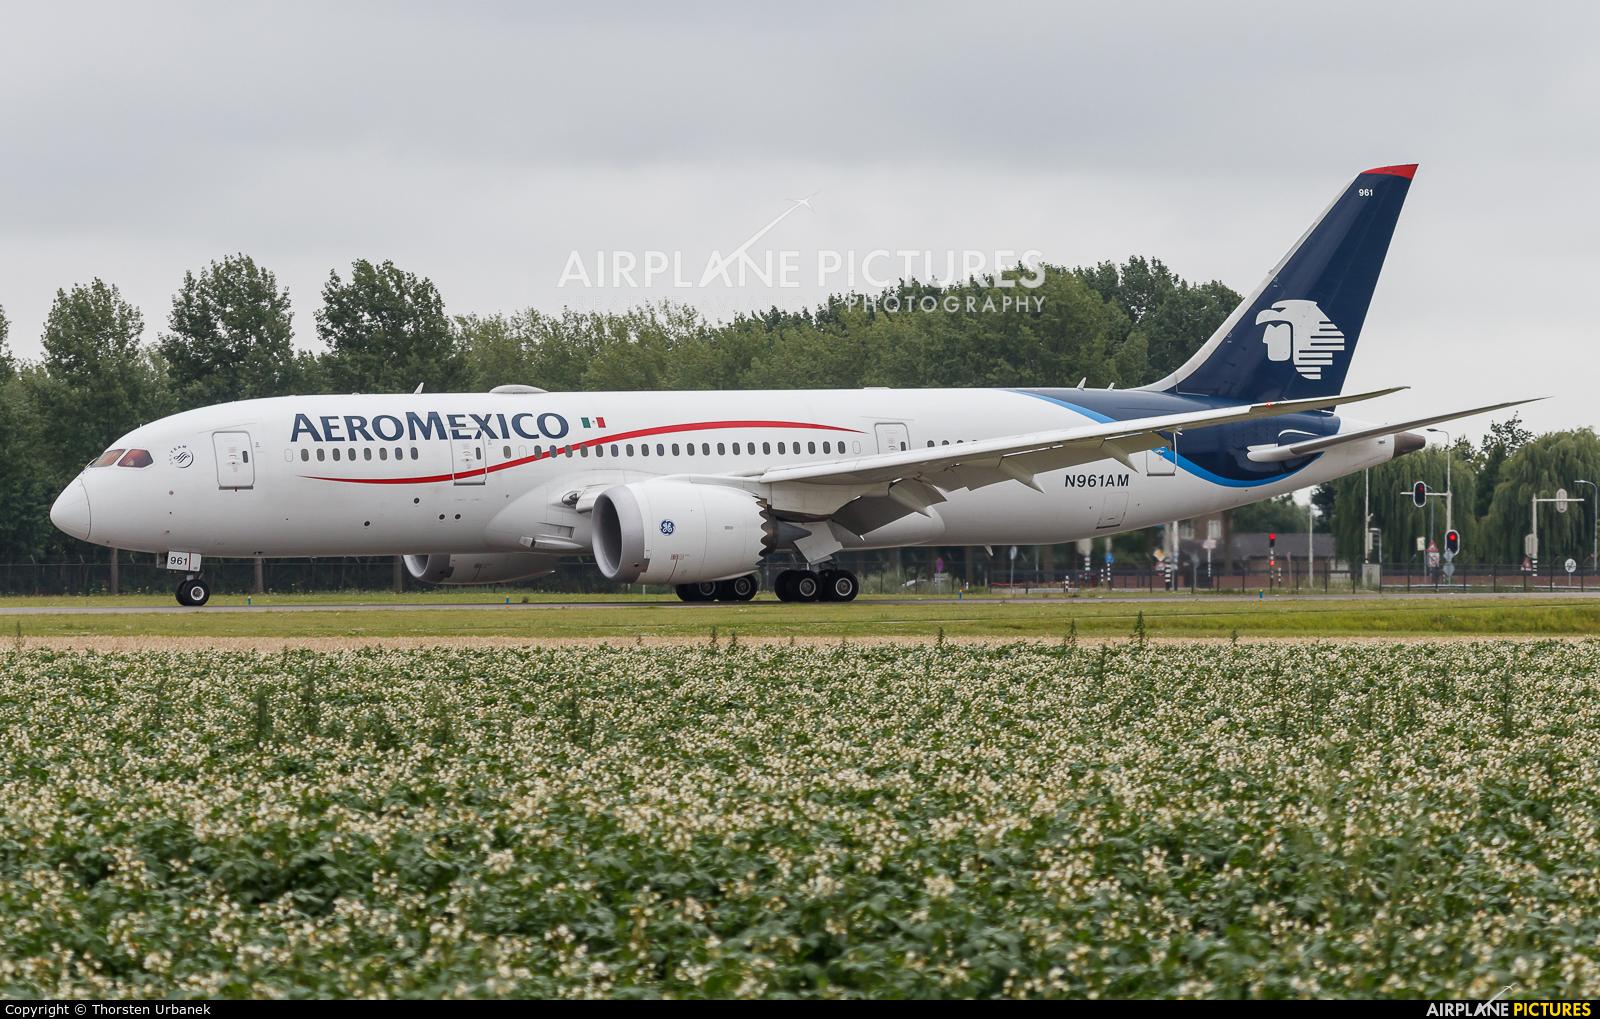 Aeromexico N961AM aircraft at Amsterdam - Schiphol